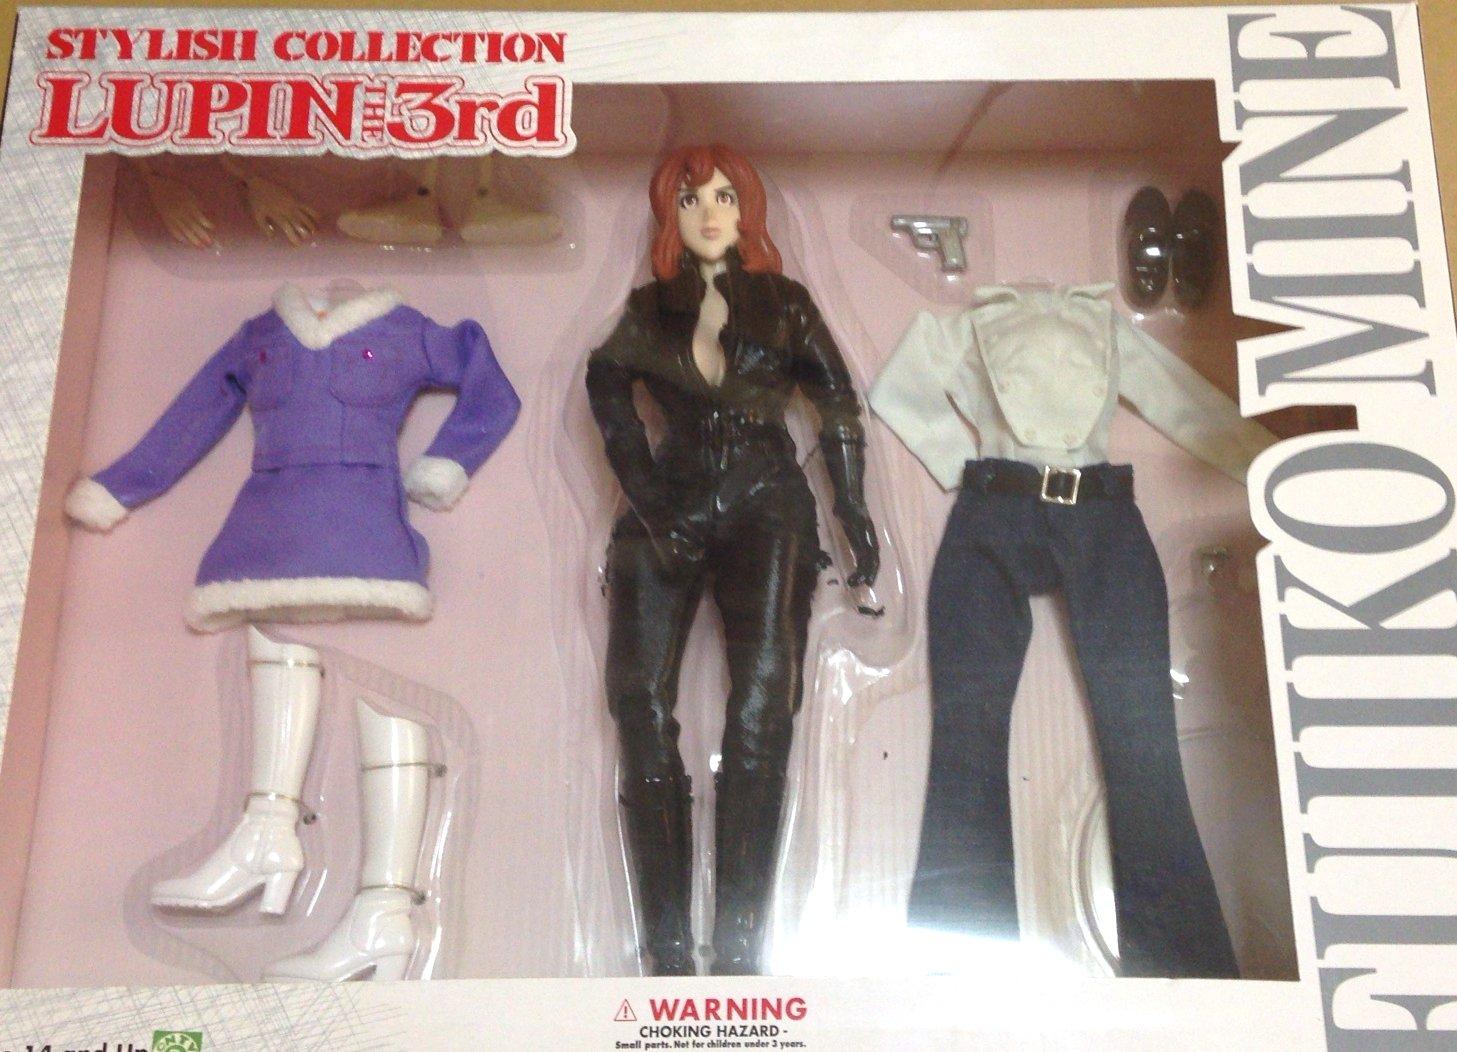 Stylish Collection - Lupin III [Fujiko Mine] (DX Ver.) (japan import)